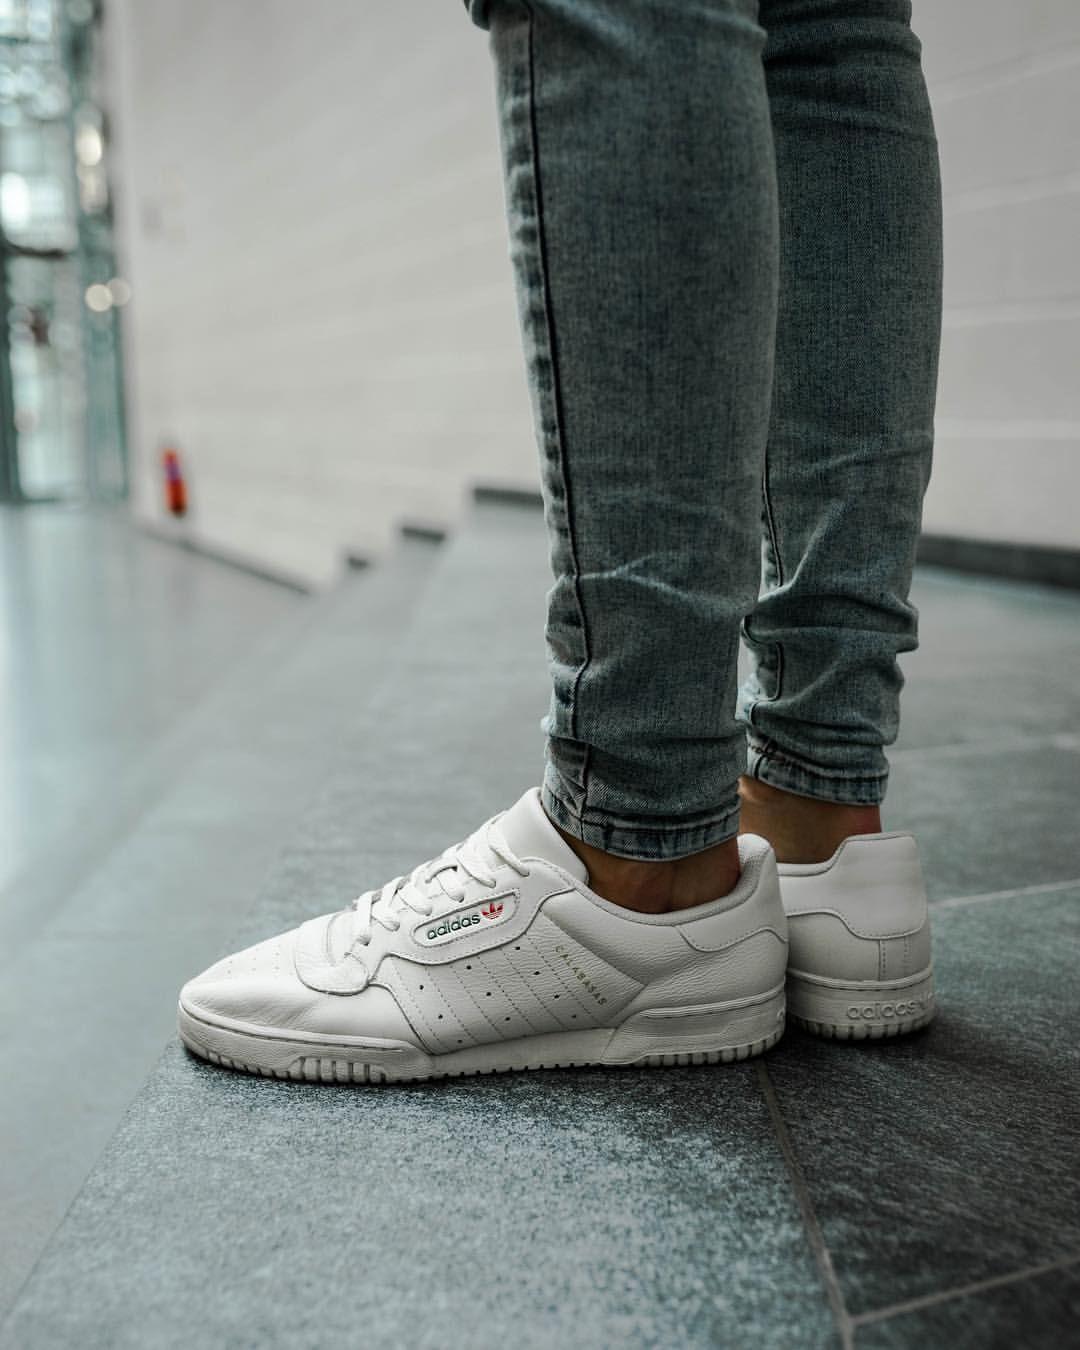 Kanye X Adidas Originals Powerphase Calabasas White Sneaker Sneakers Shoes